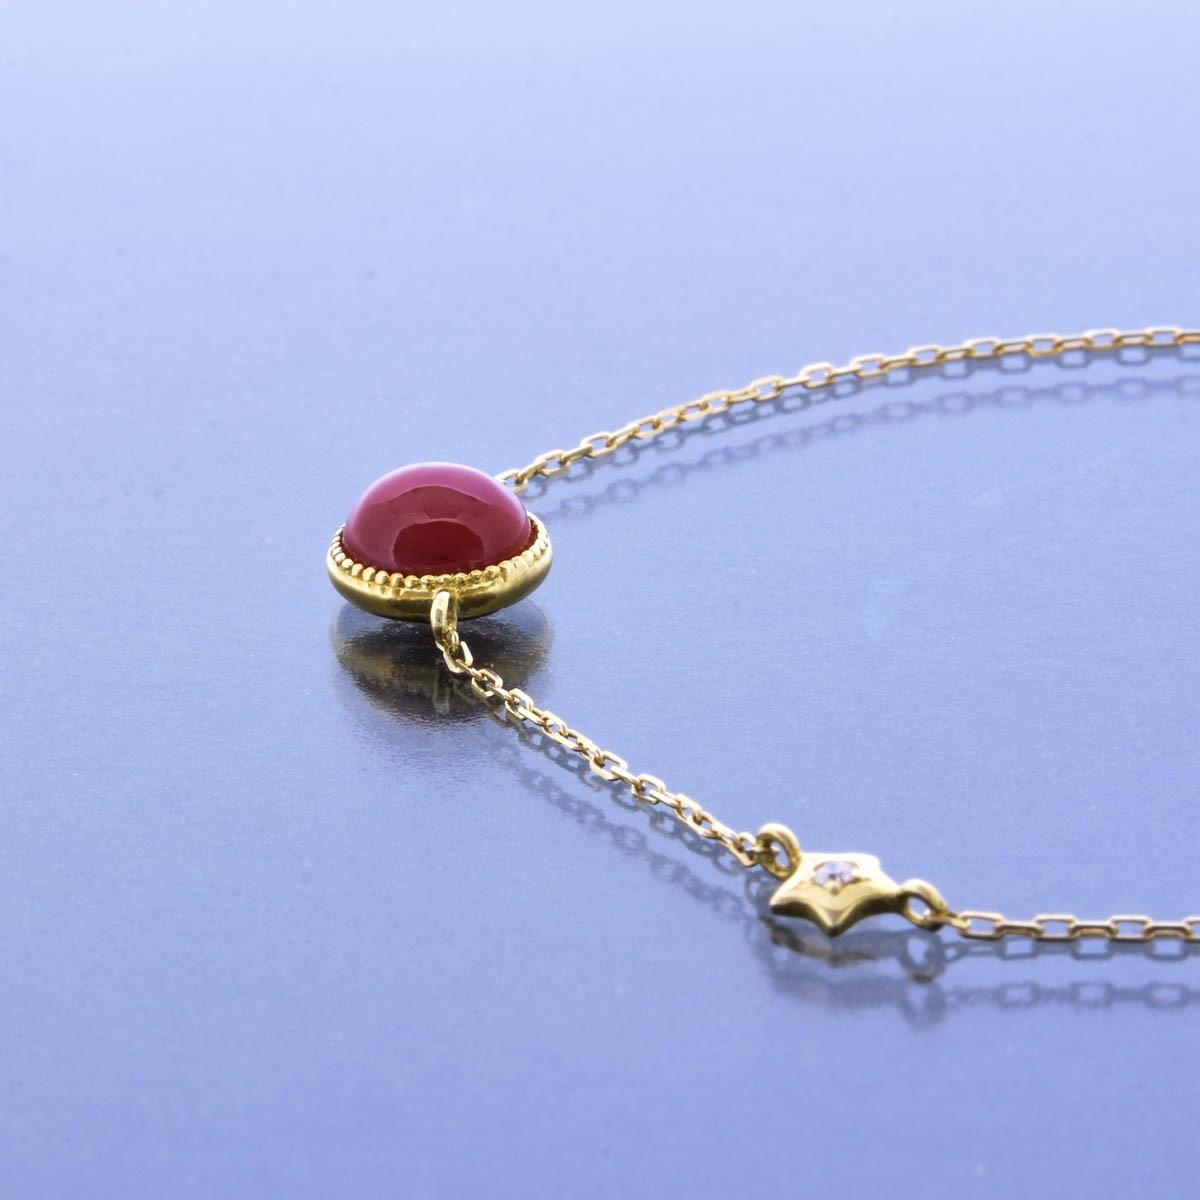 K18YG 赤珊瑚 ブレスレット 星座 モチーフ 獅子座 しし座